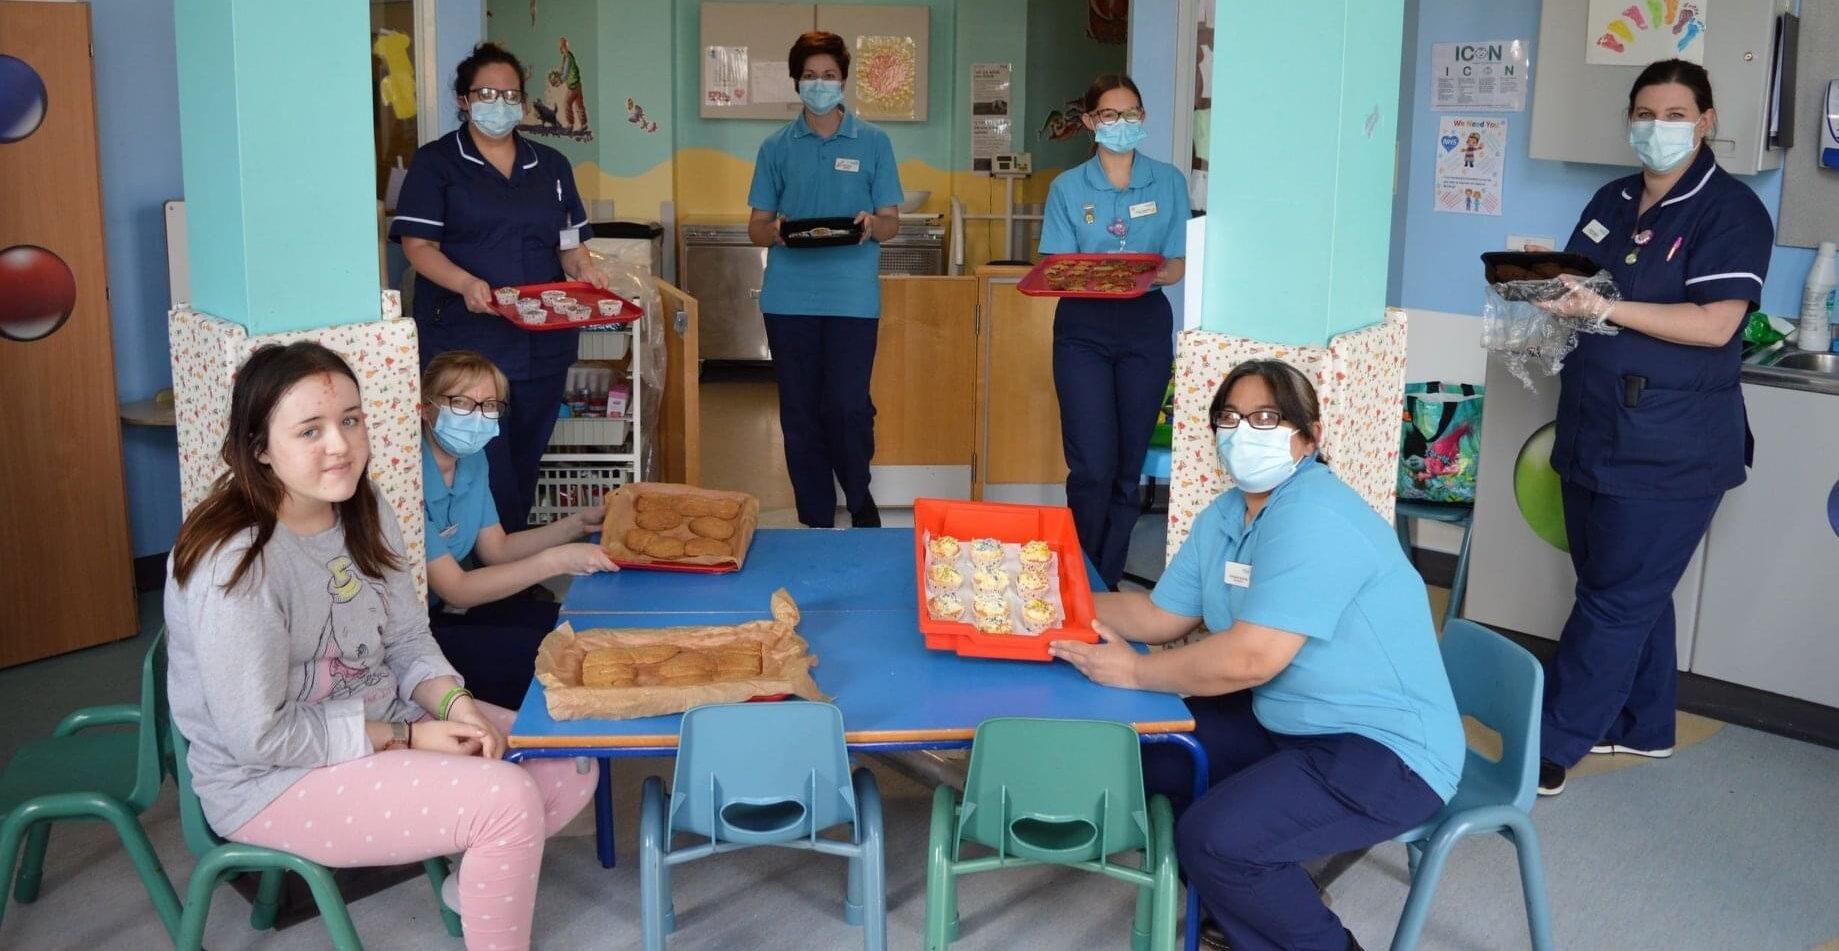 Play Team bakery